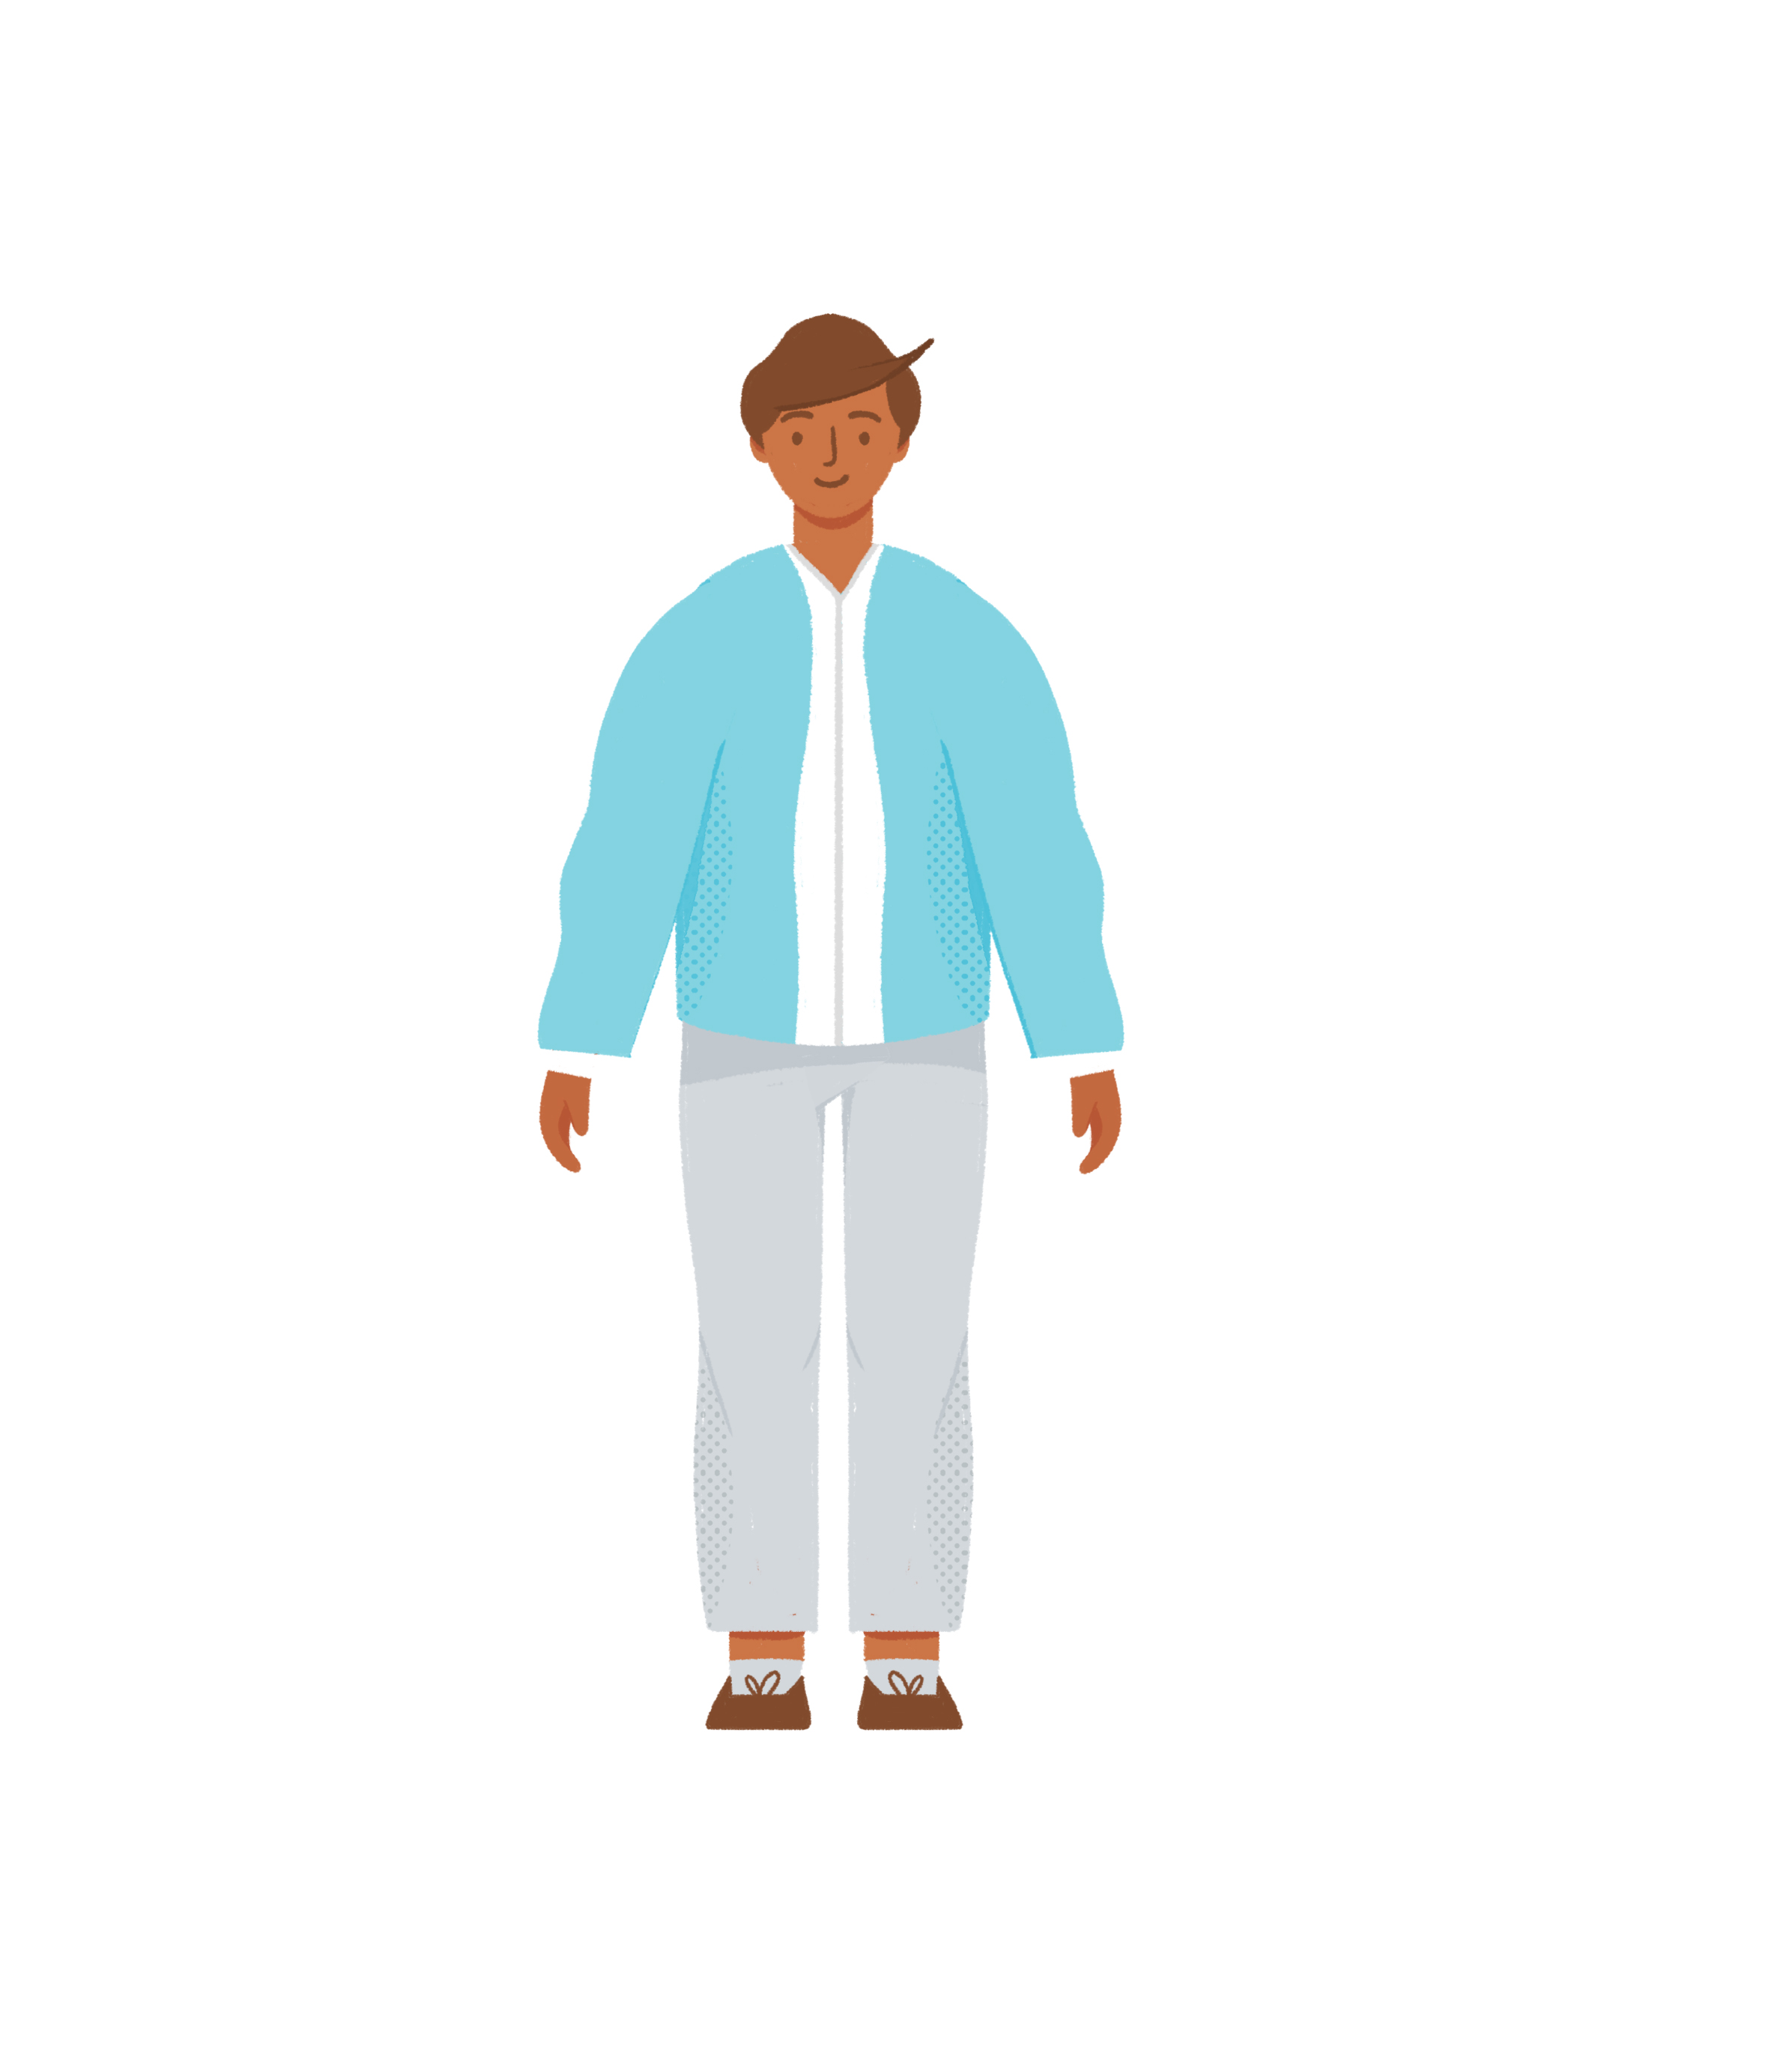 character sheetfront_op2.jpg